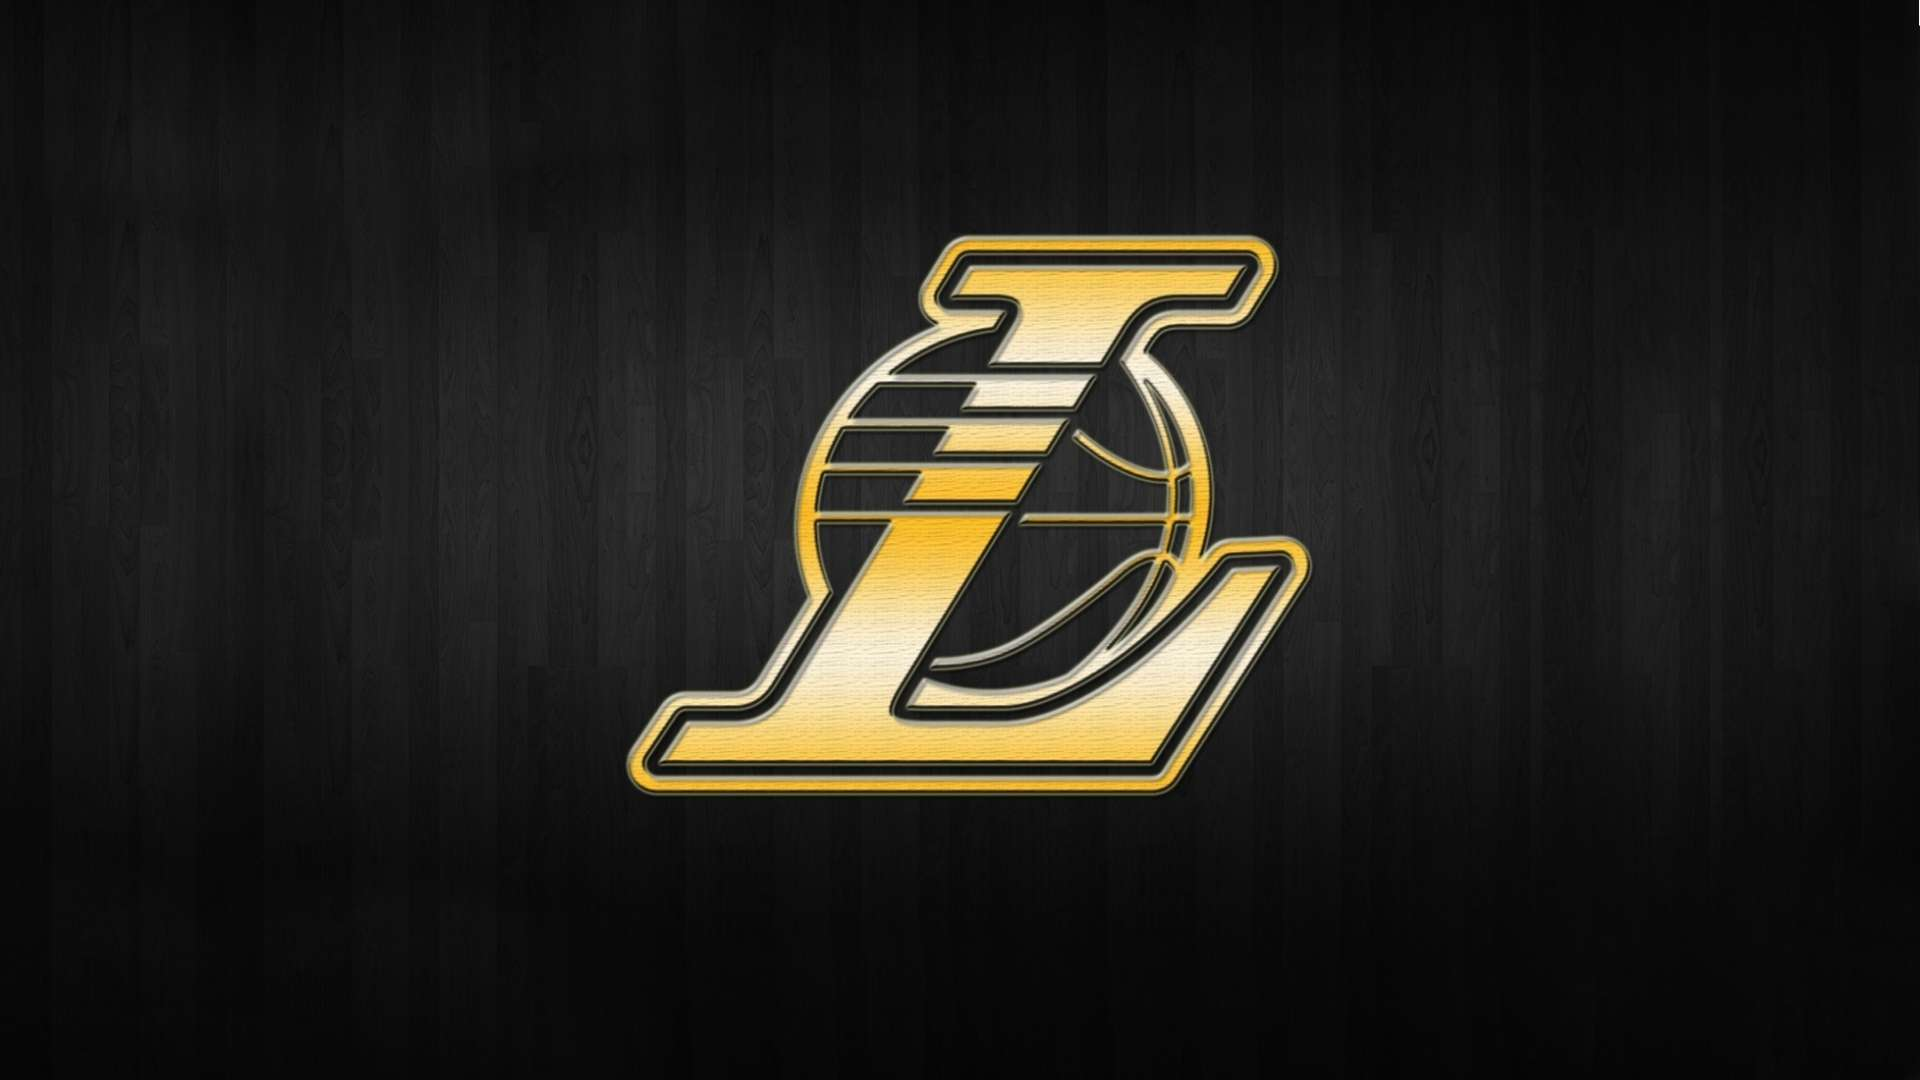 Los Angeles Lakers Nba Logo Background Gold Hd Wallpaper 1080p 1920x1080